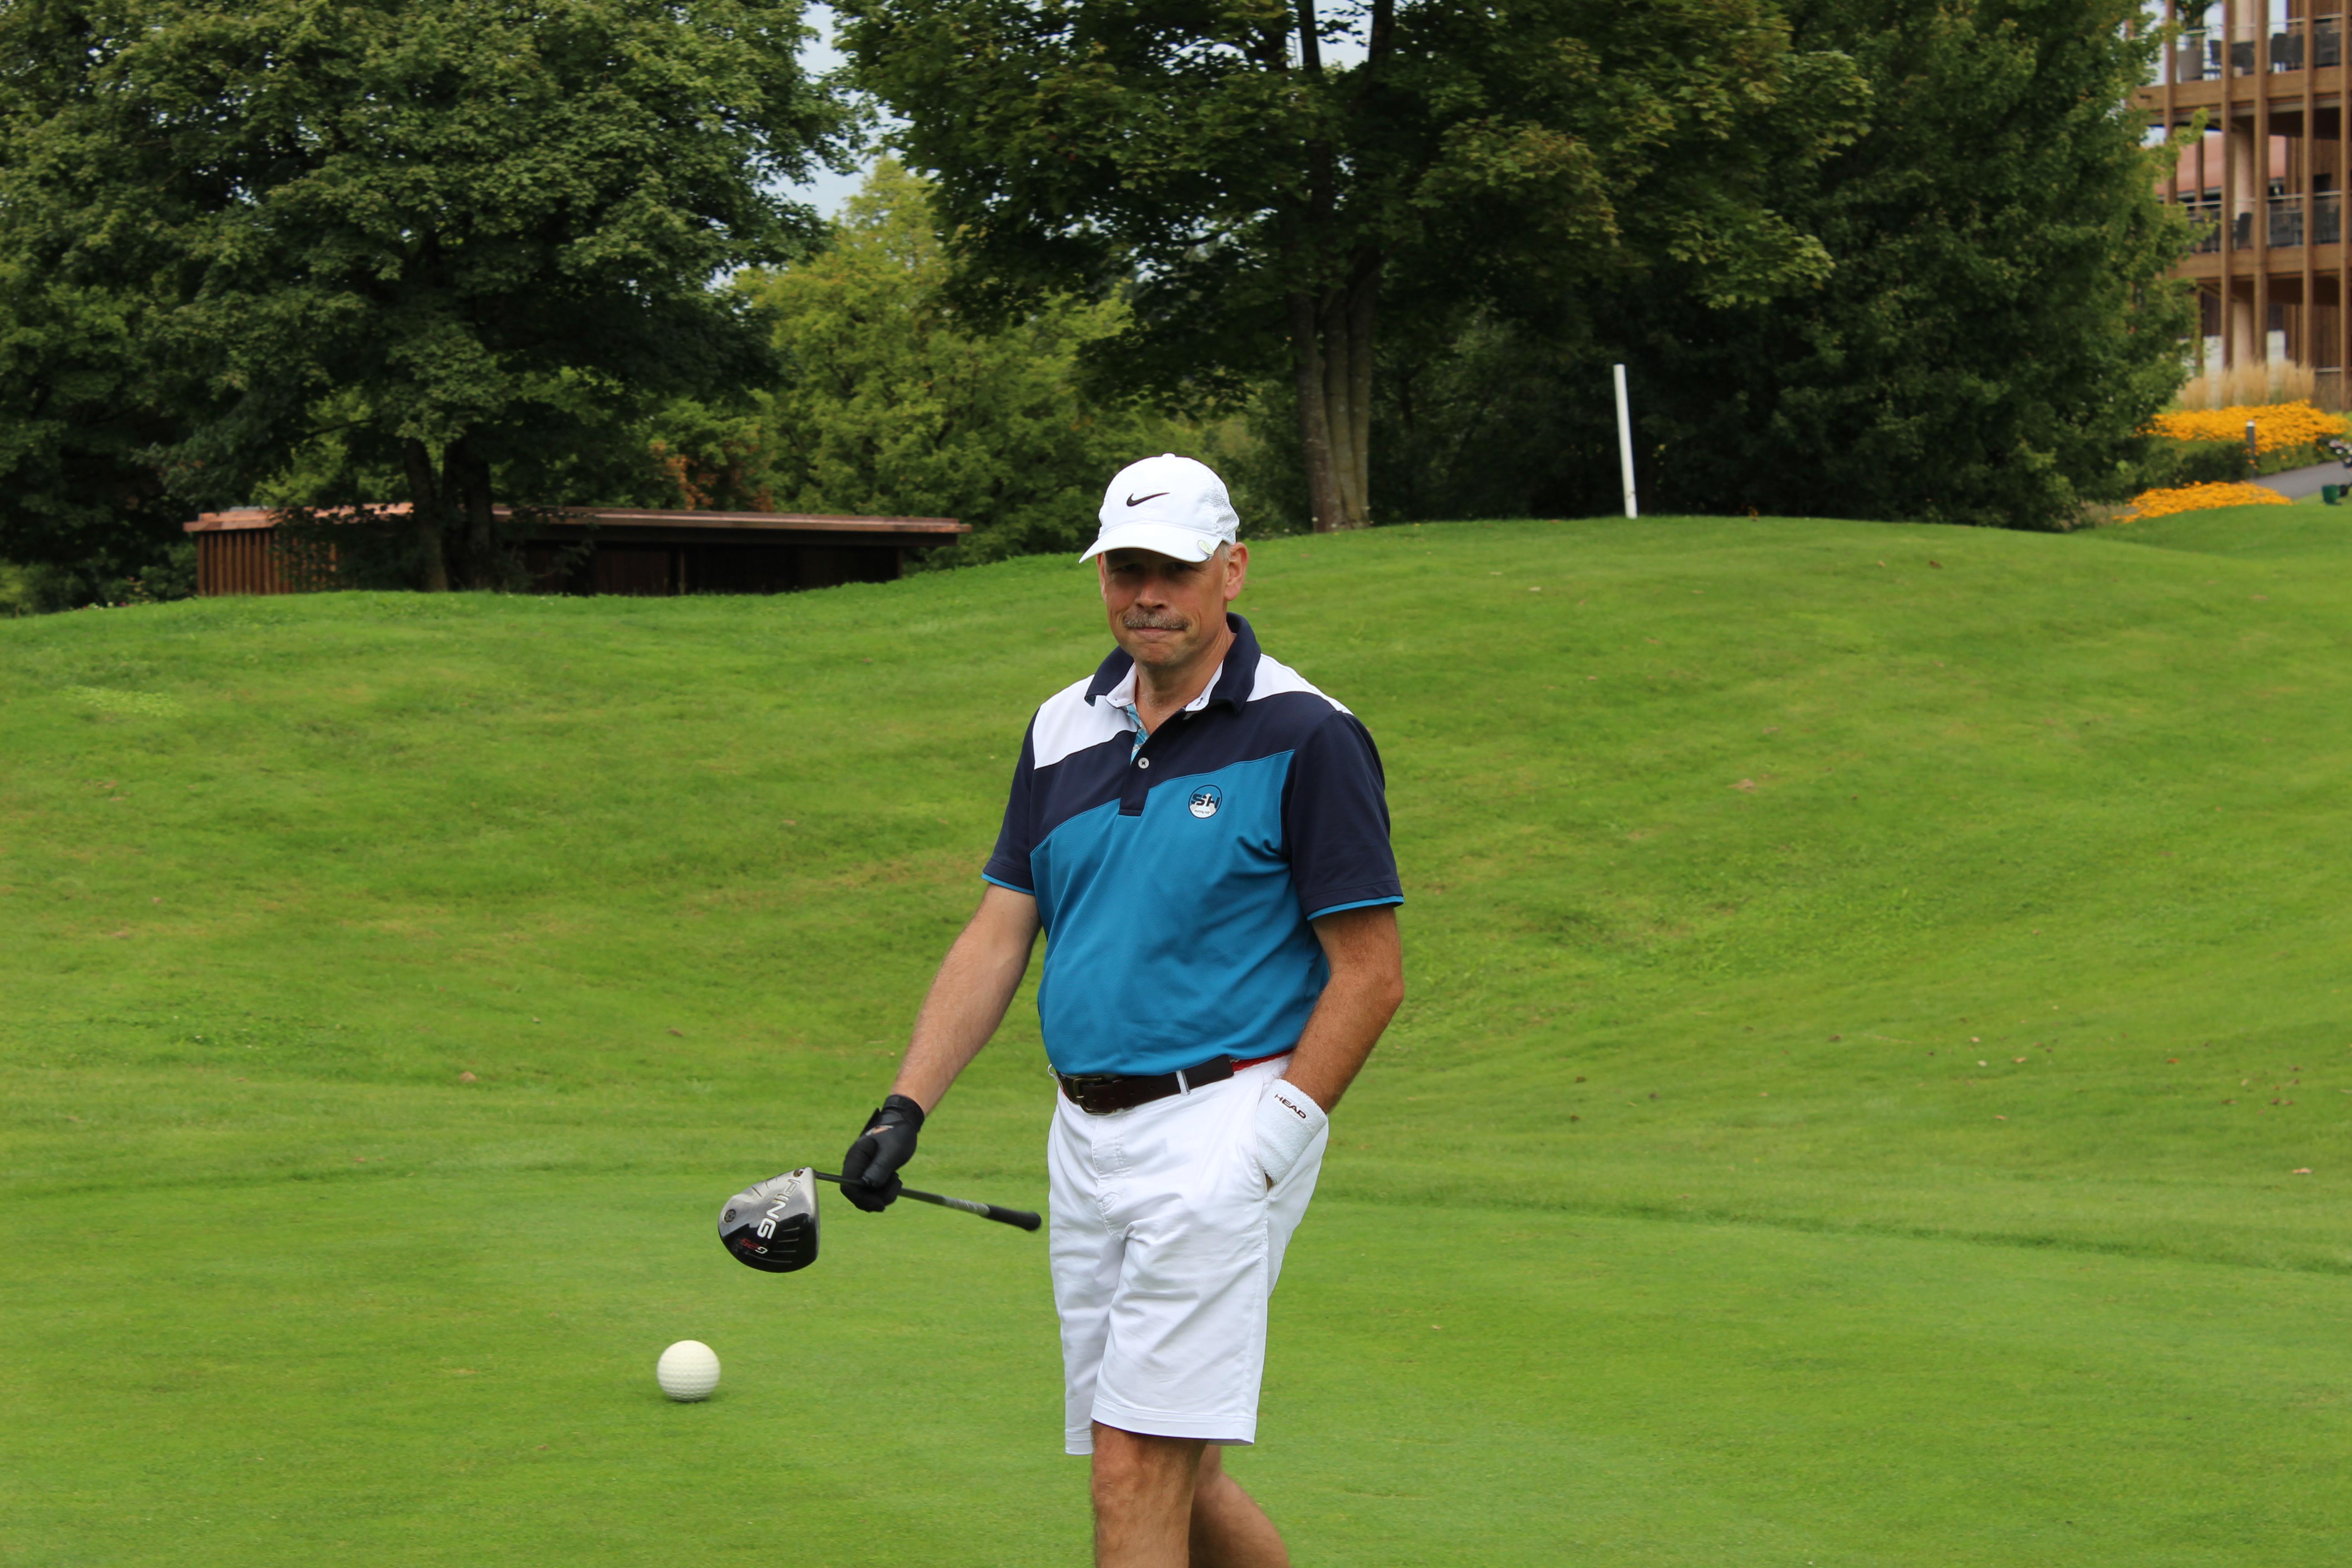 EVZ Kristalclub Golf Turnier 21.8.2017 126